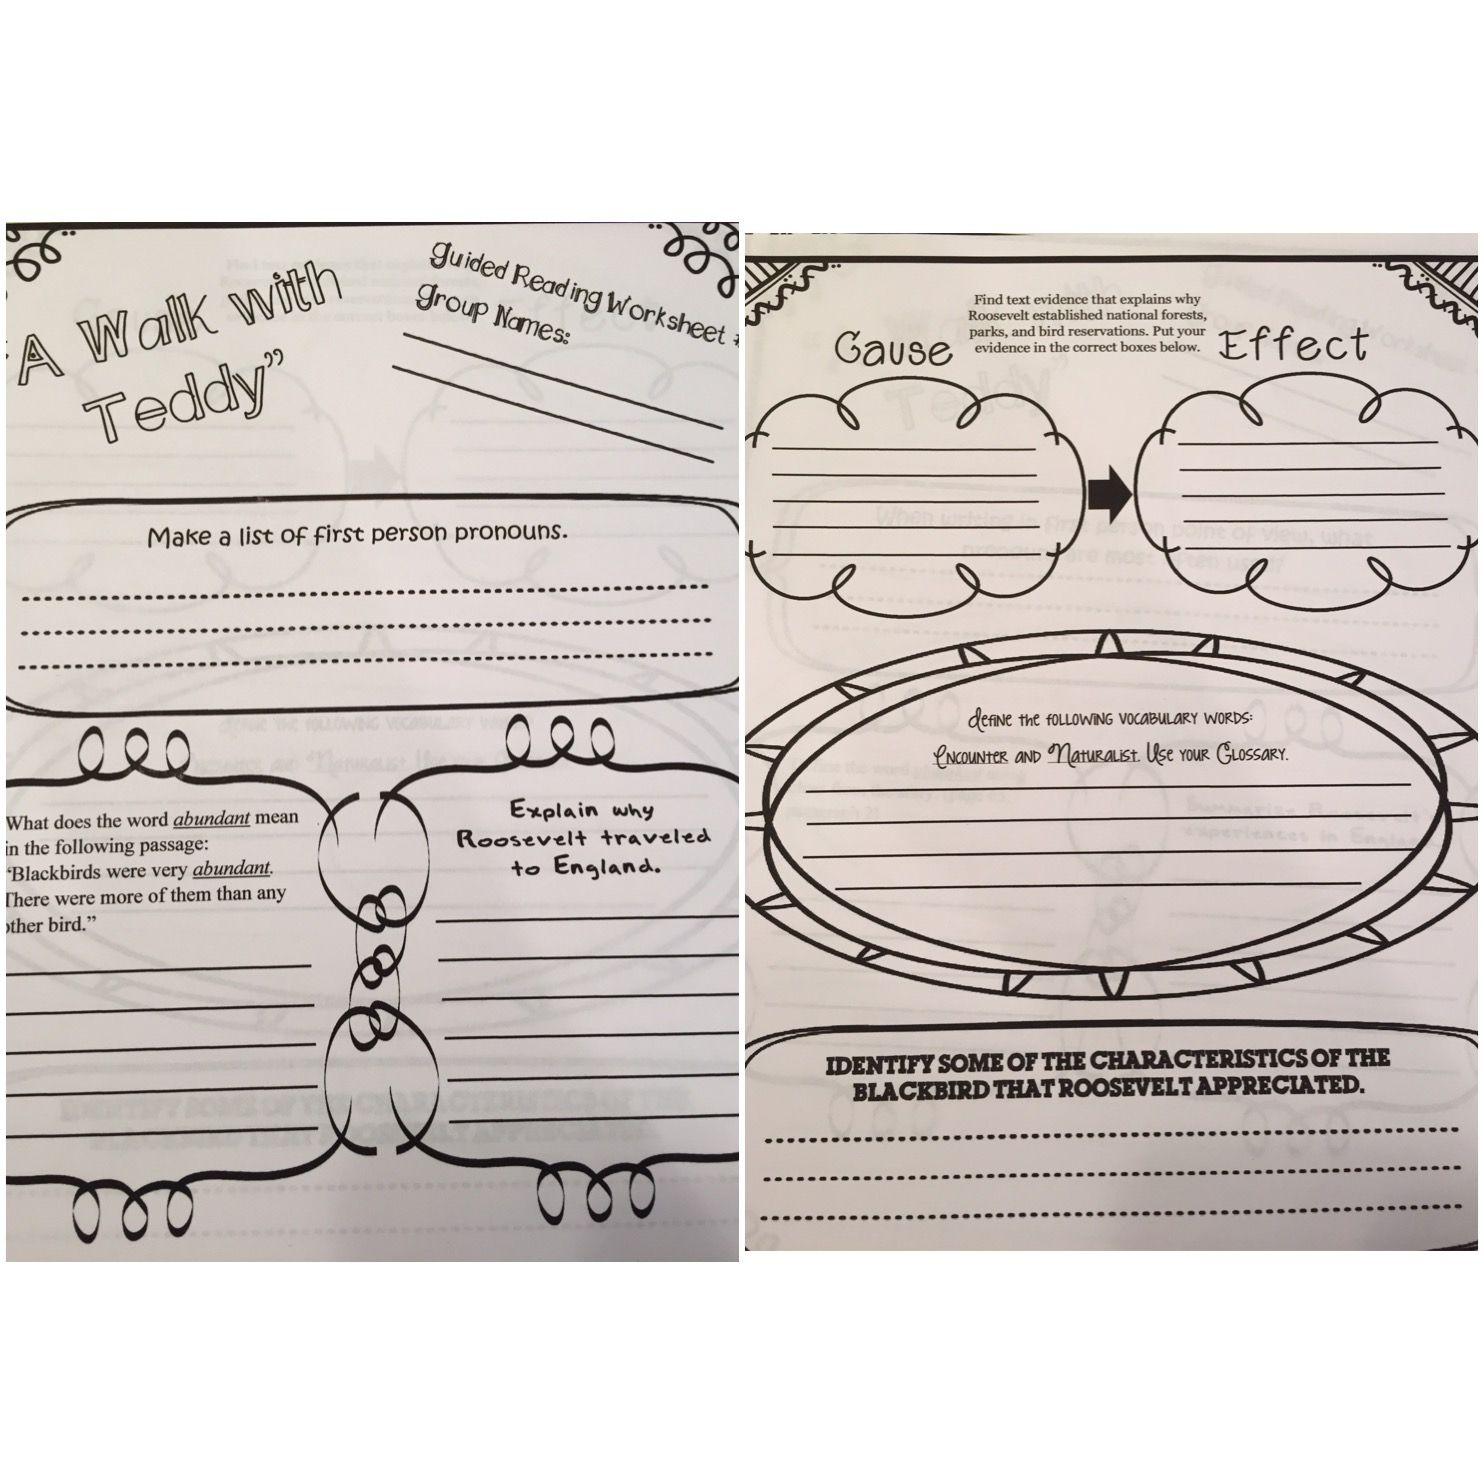 A Walk With Teddy Leveled Worksheet 2 Lists To Make 5th Grade Ela Black Bird